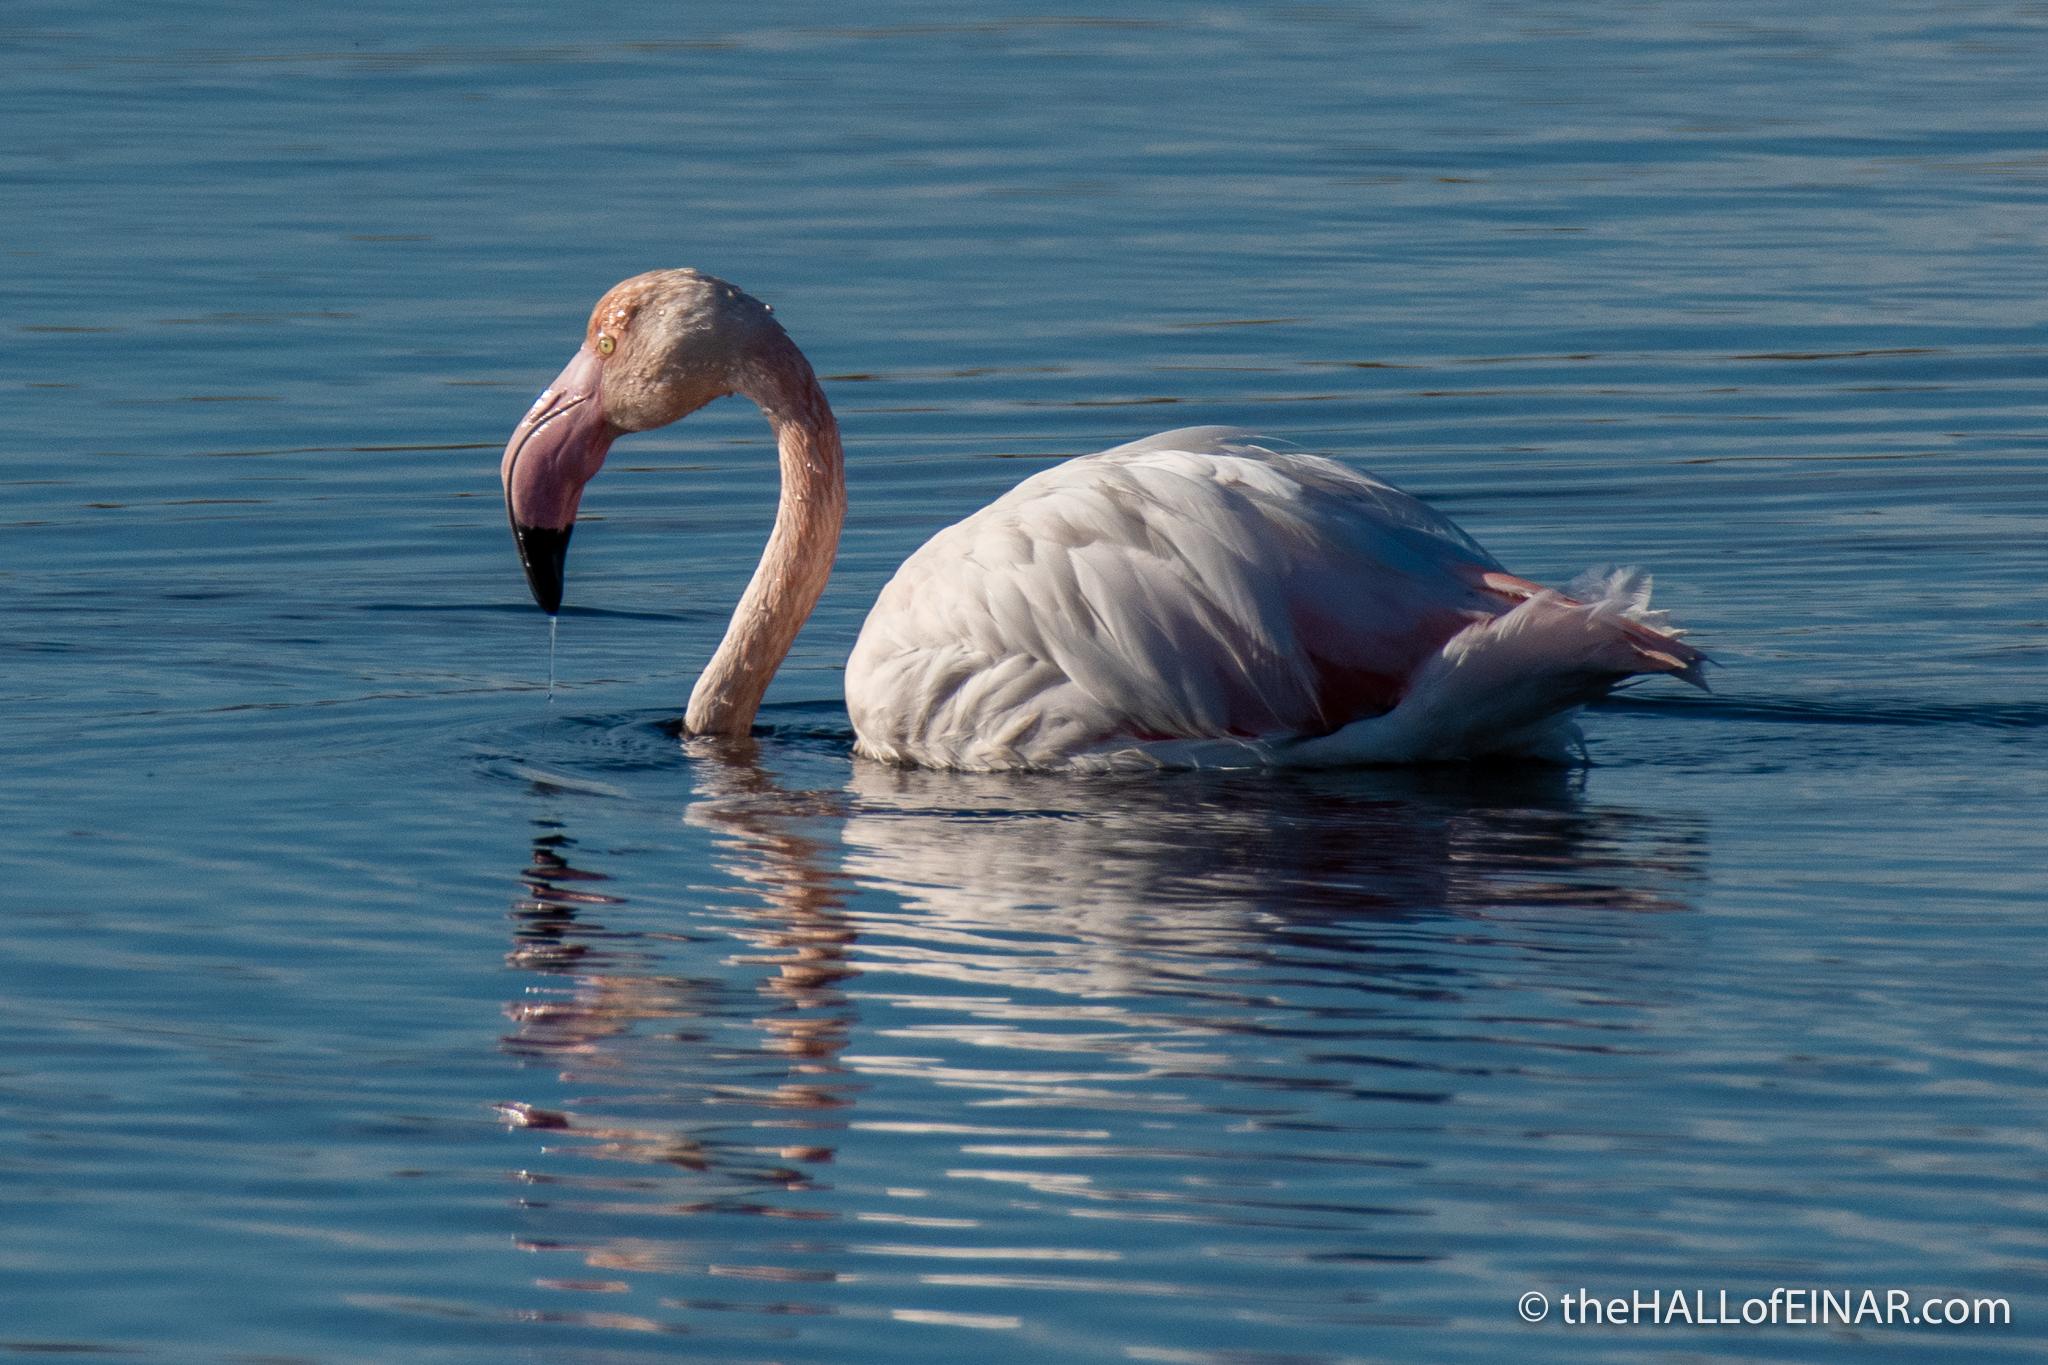 Flamingo - Orbetello - The Hall of Einar - photograph (c) David Bailey (not the)